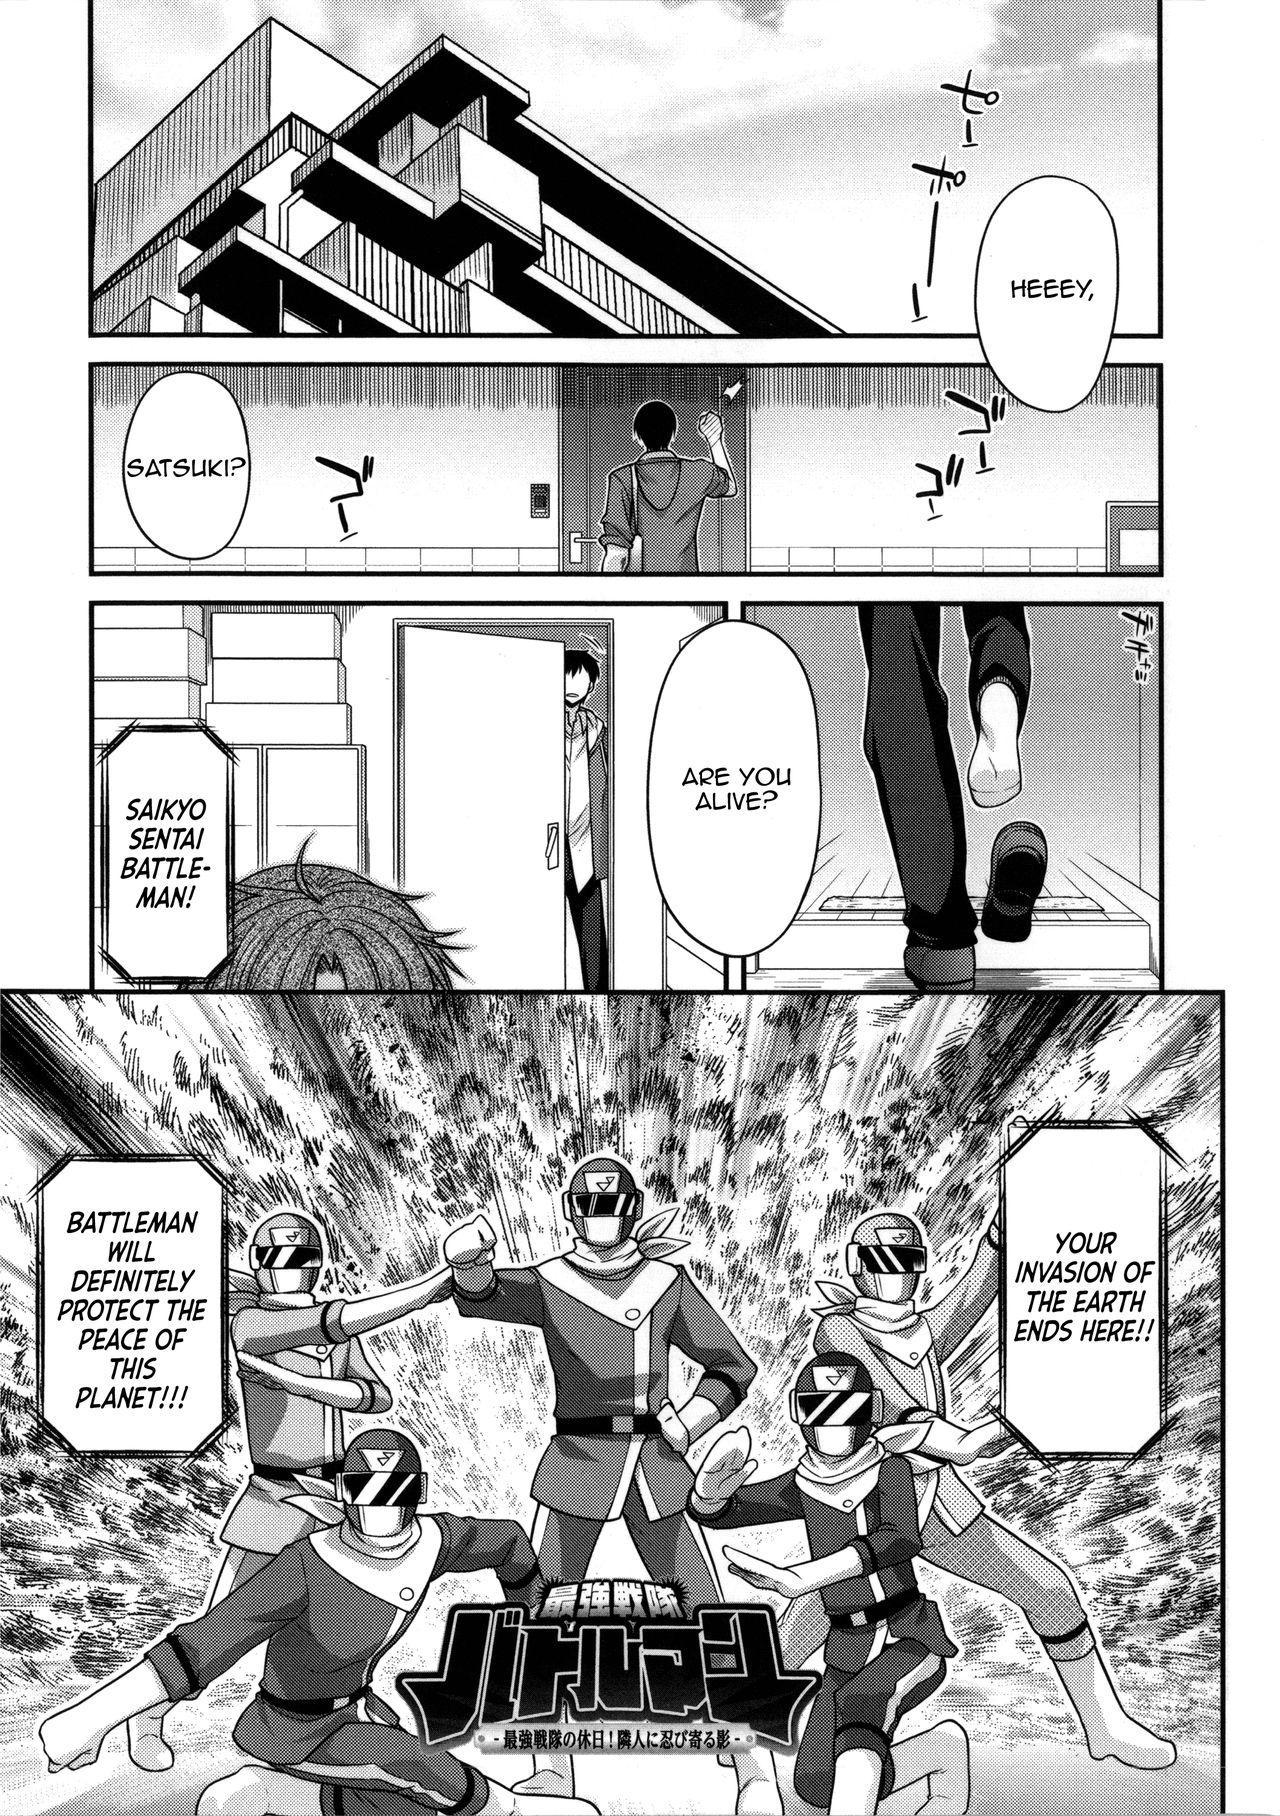 [Miyashiro Sousuke] Yamato Nadeshiko Chichi Henge - Yamato Nadeshiko Breast Changes Ch. 0-1, 4-5, 7-9 [English] 45